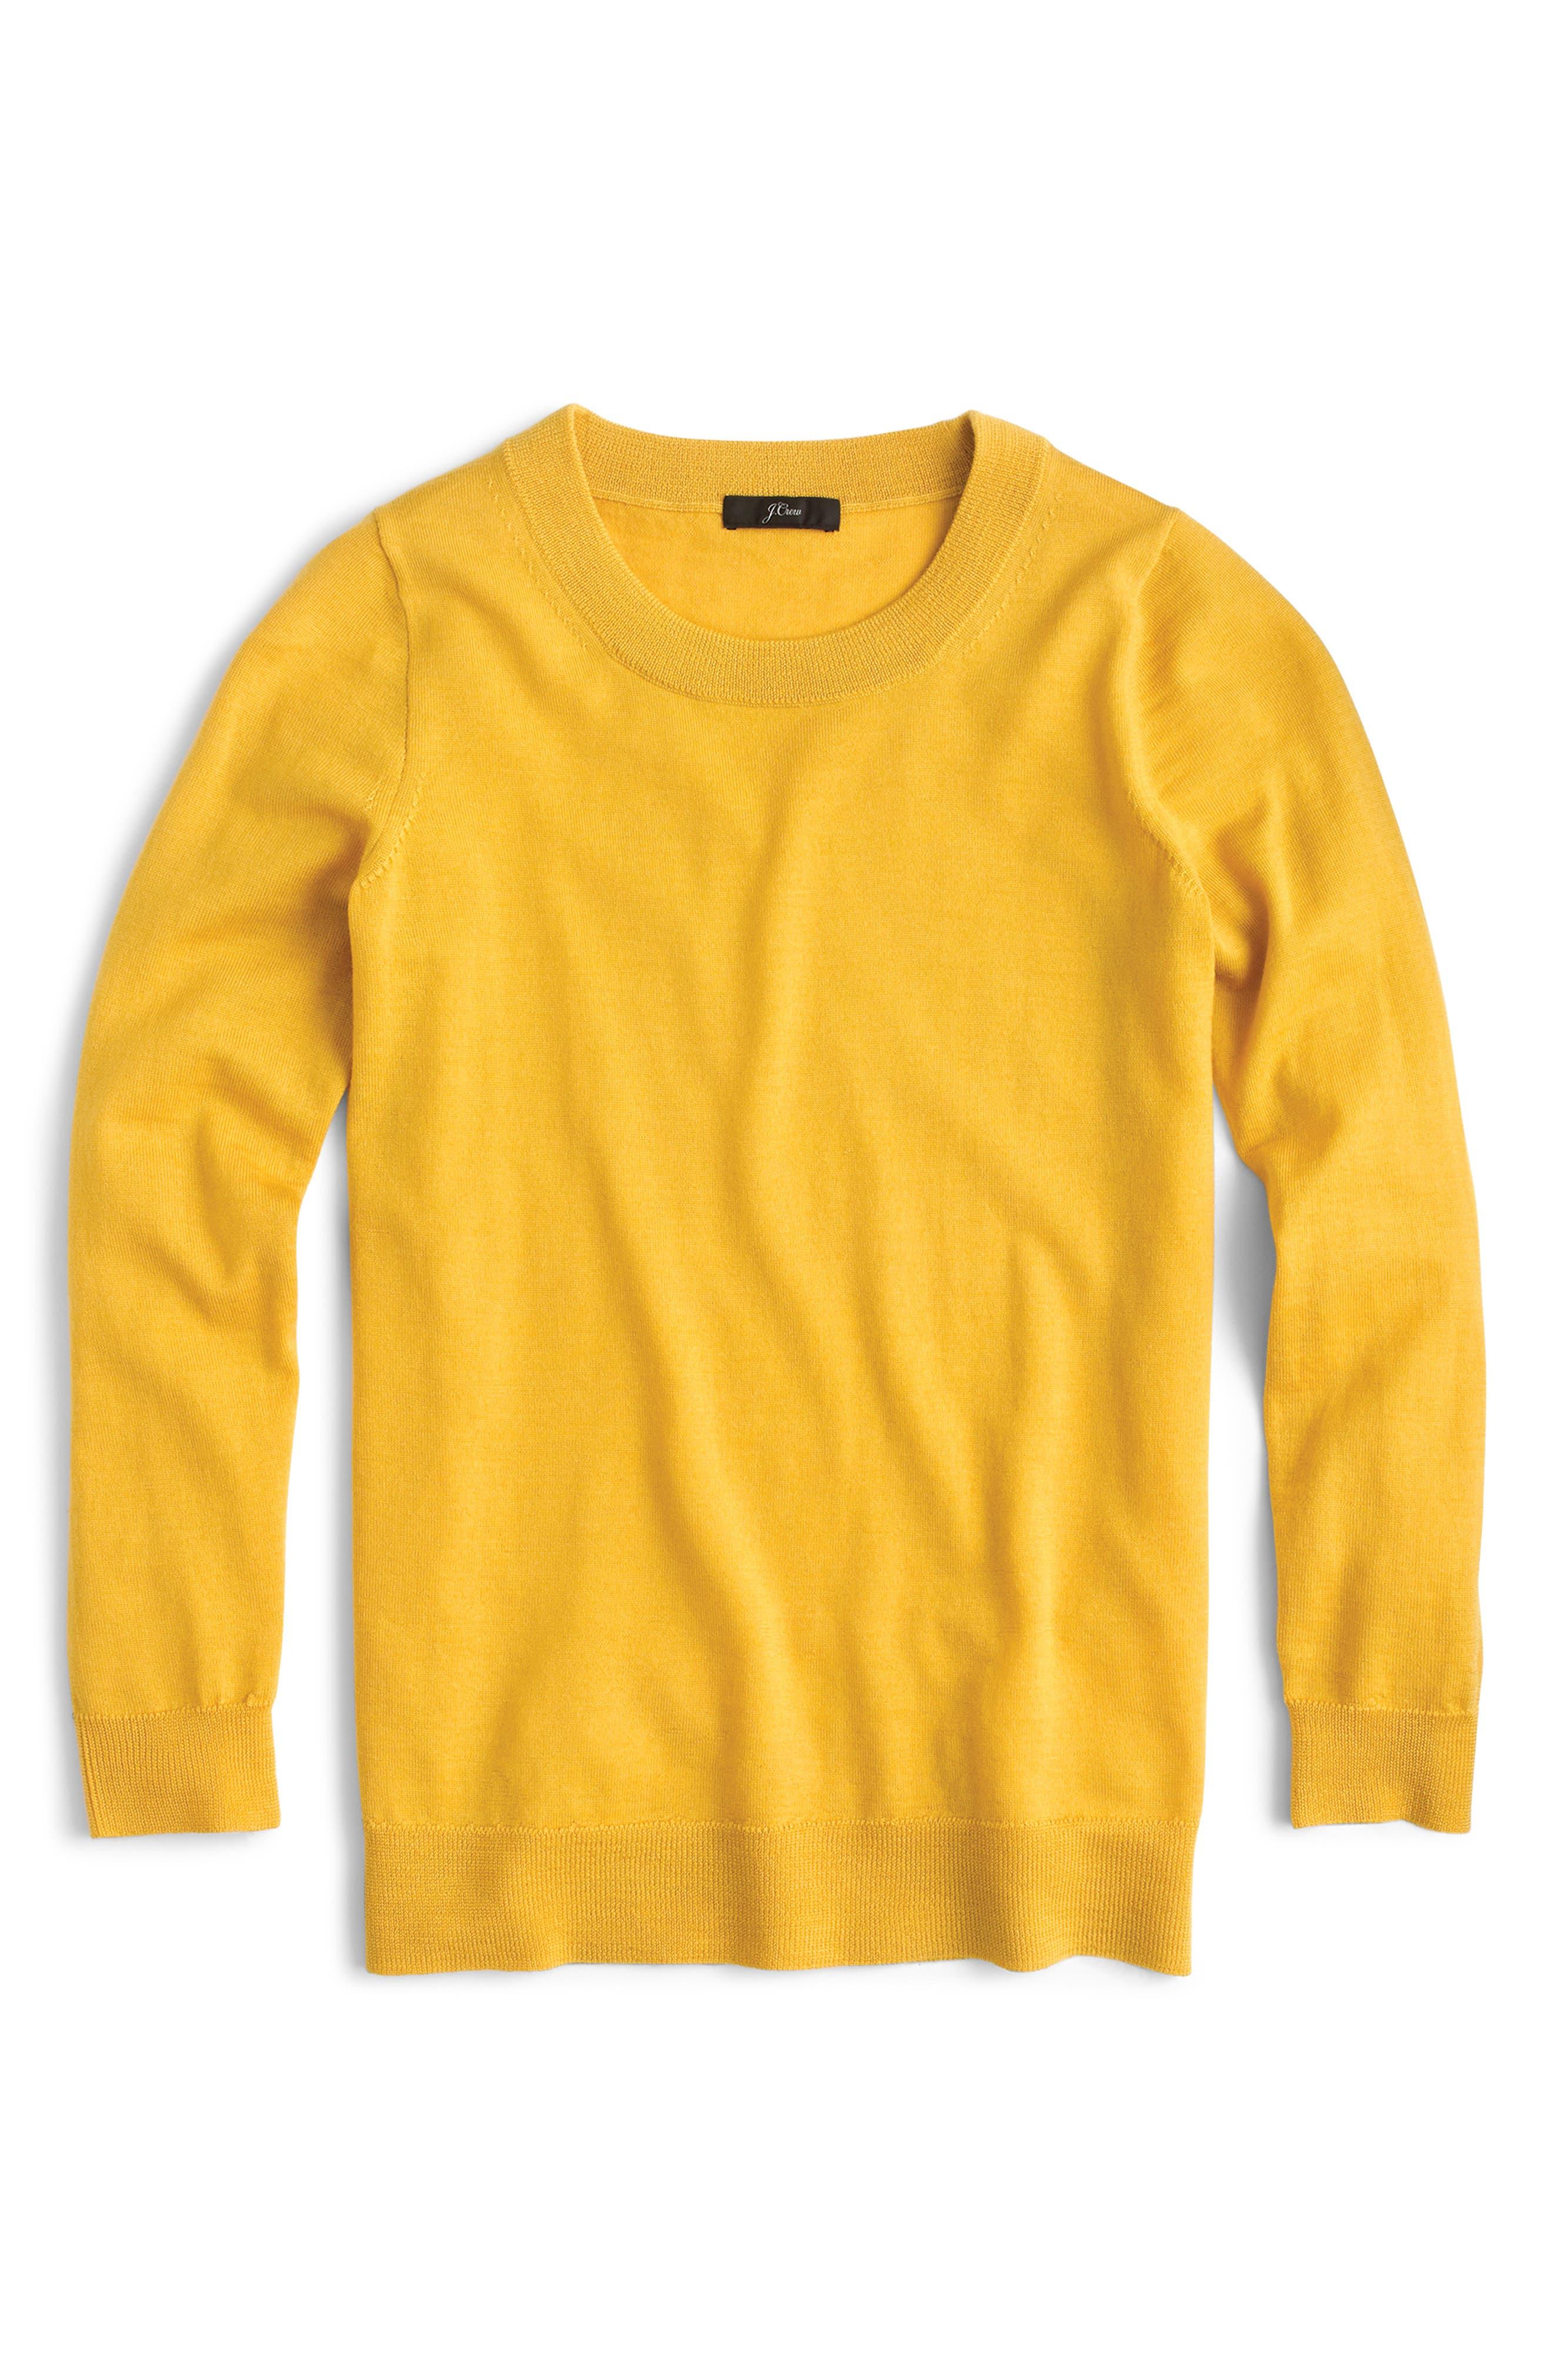 6928d2165 Women's Pink Sweaters | Nordstrom